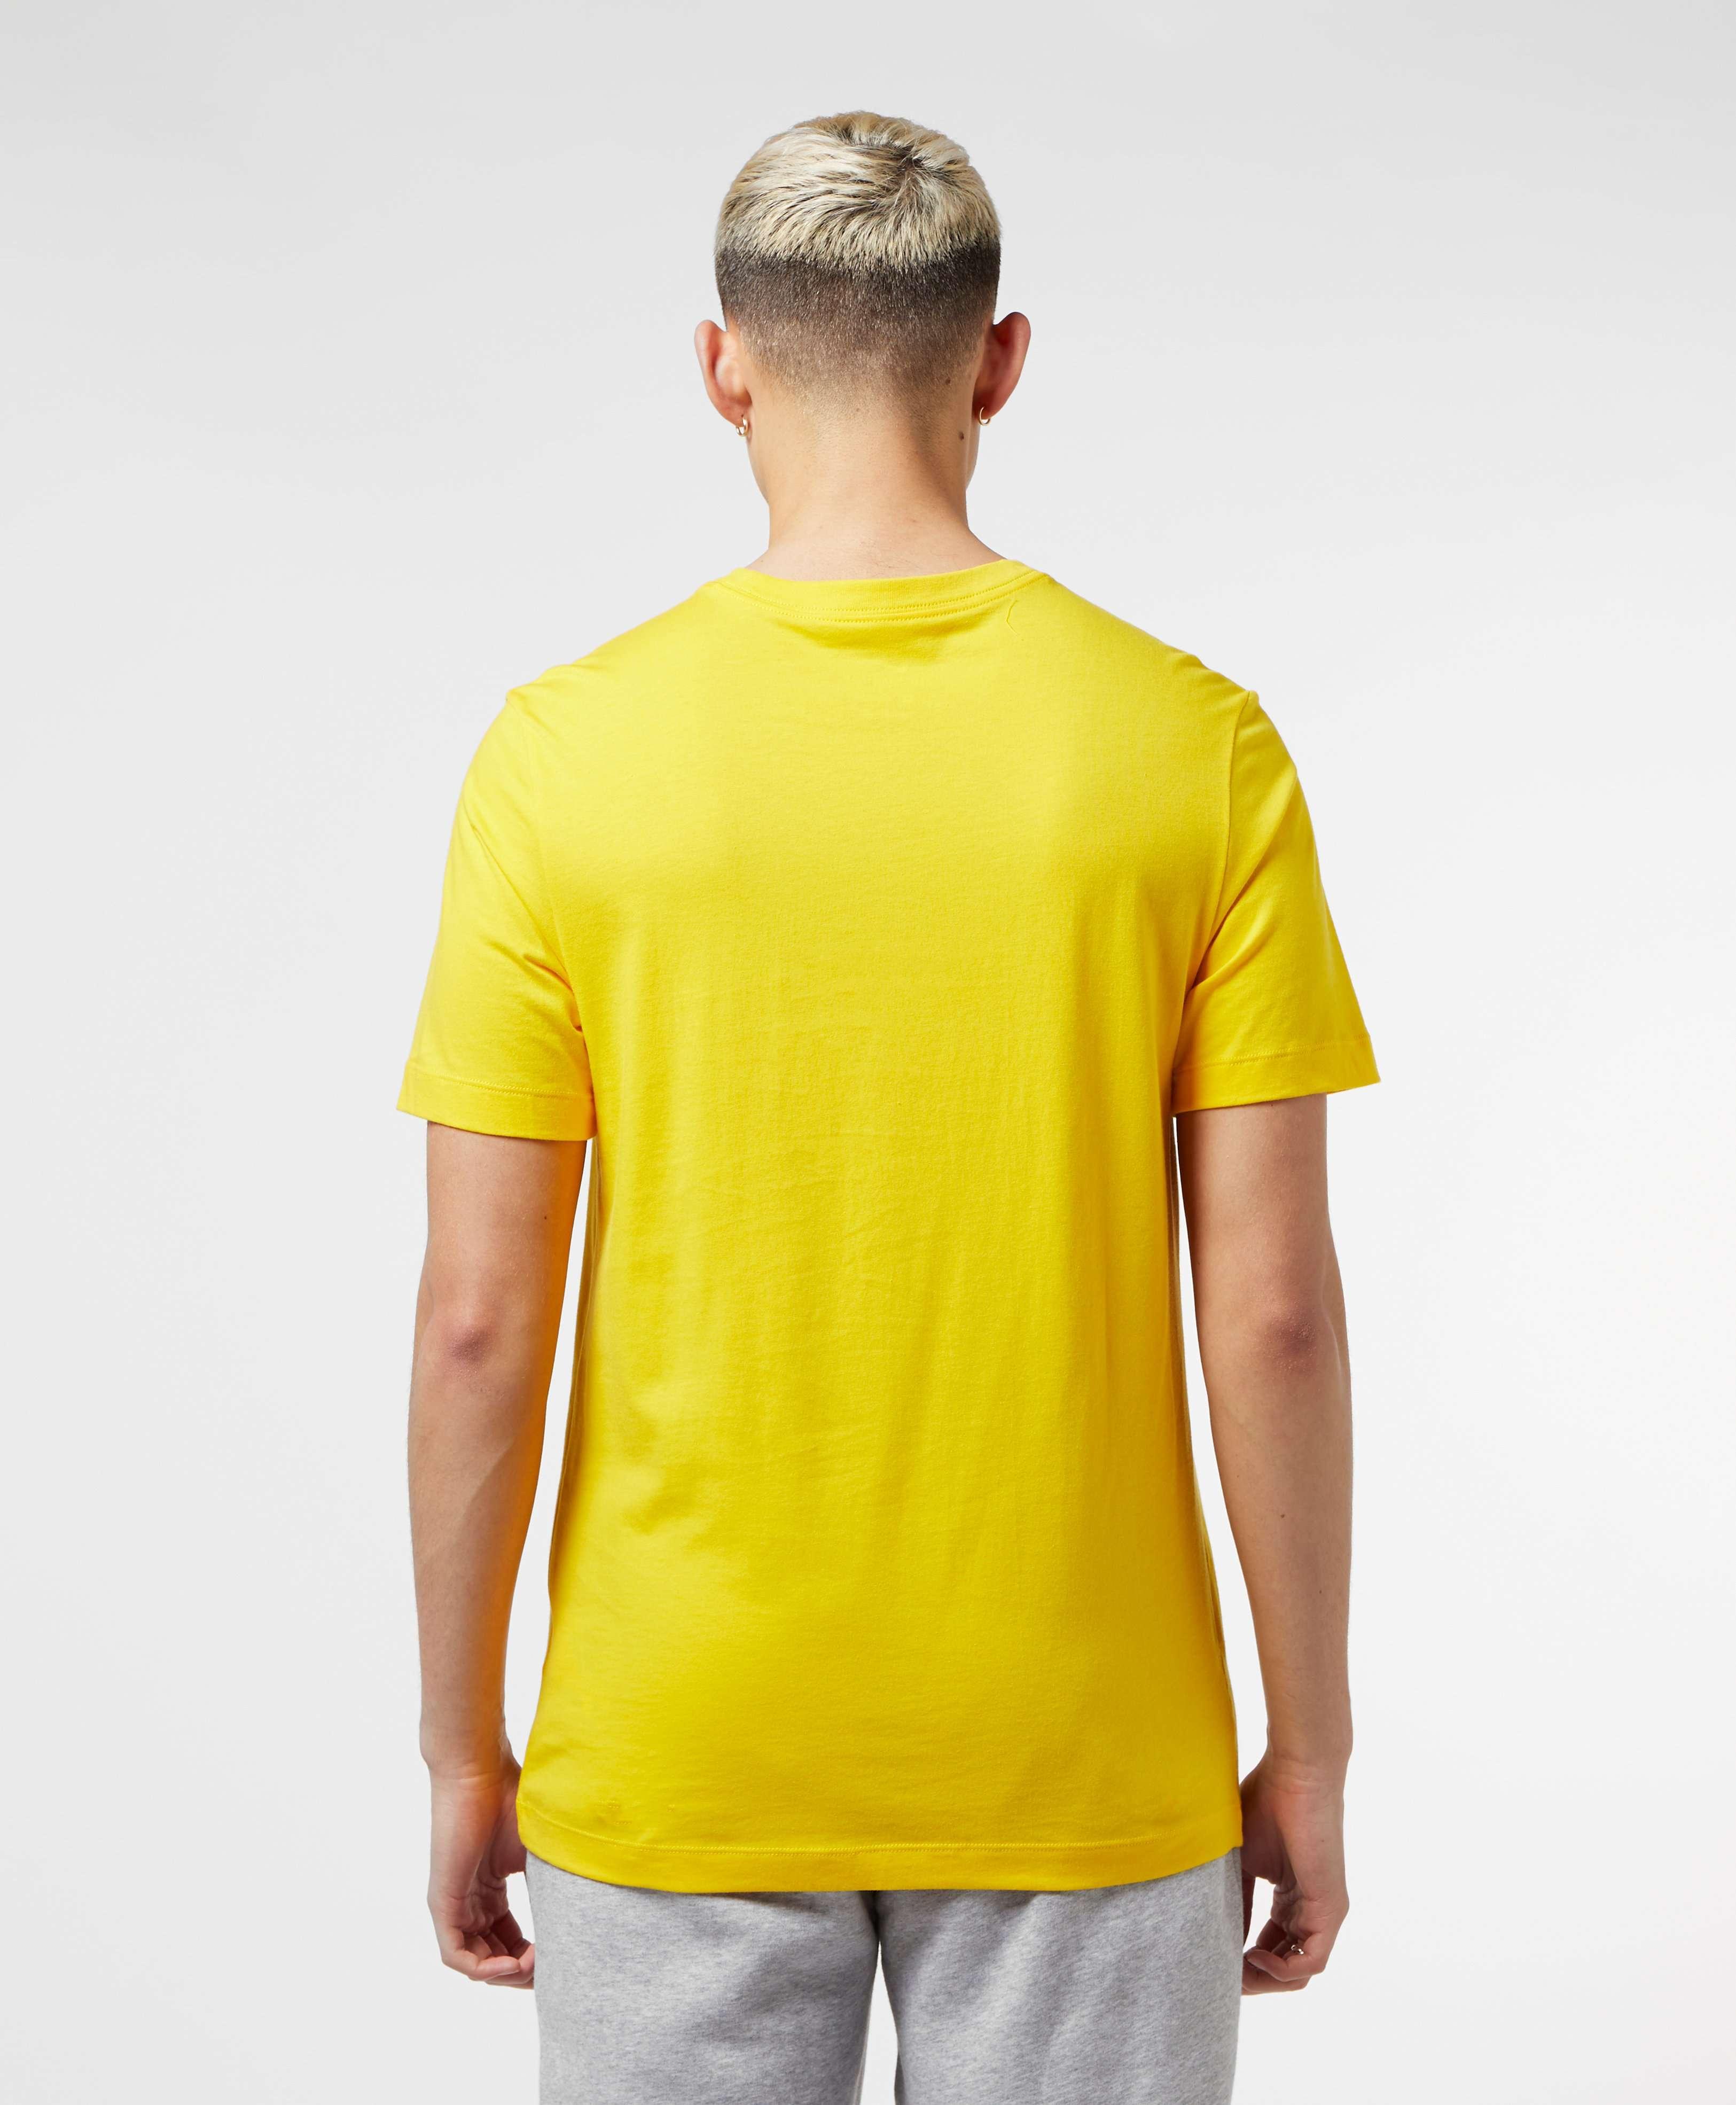 Nike Sportswear Short Sleeve Logo T-Shirt